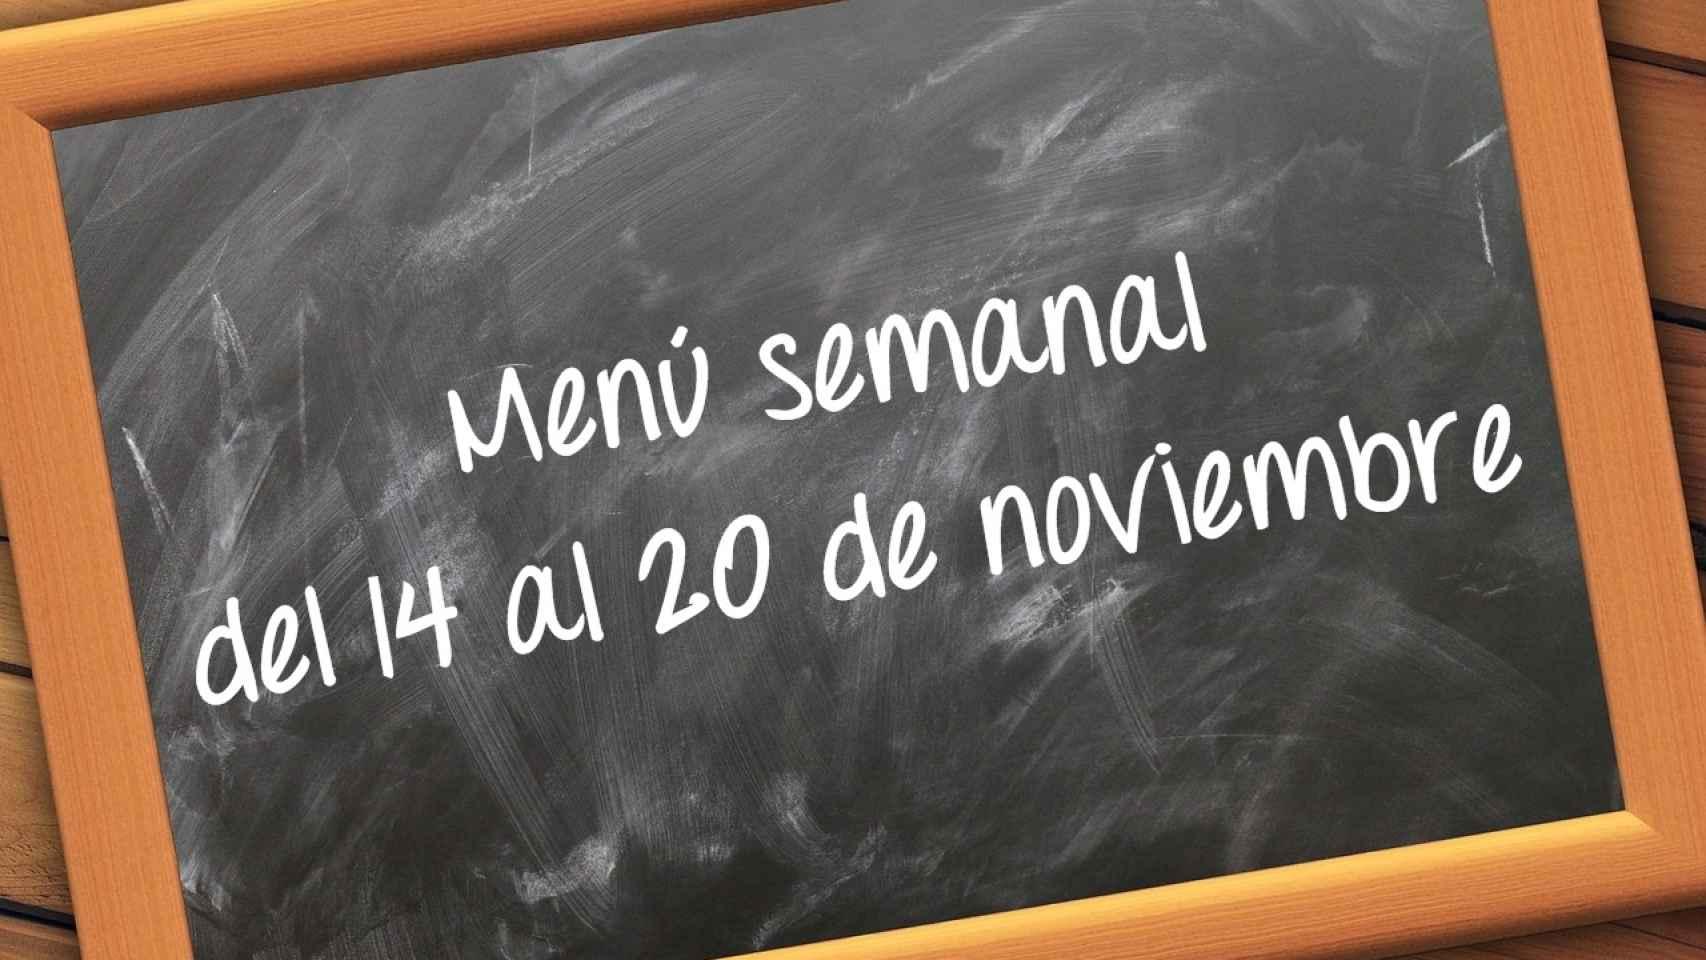 menu-semanal-14-20-nov